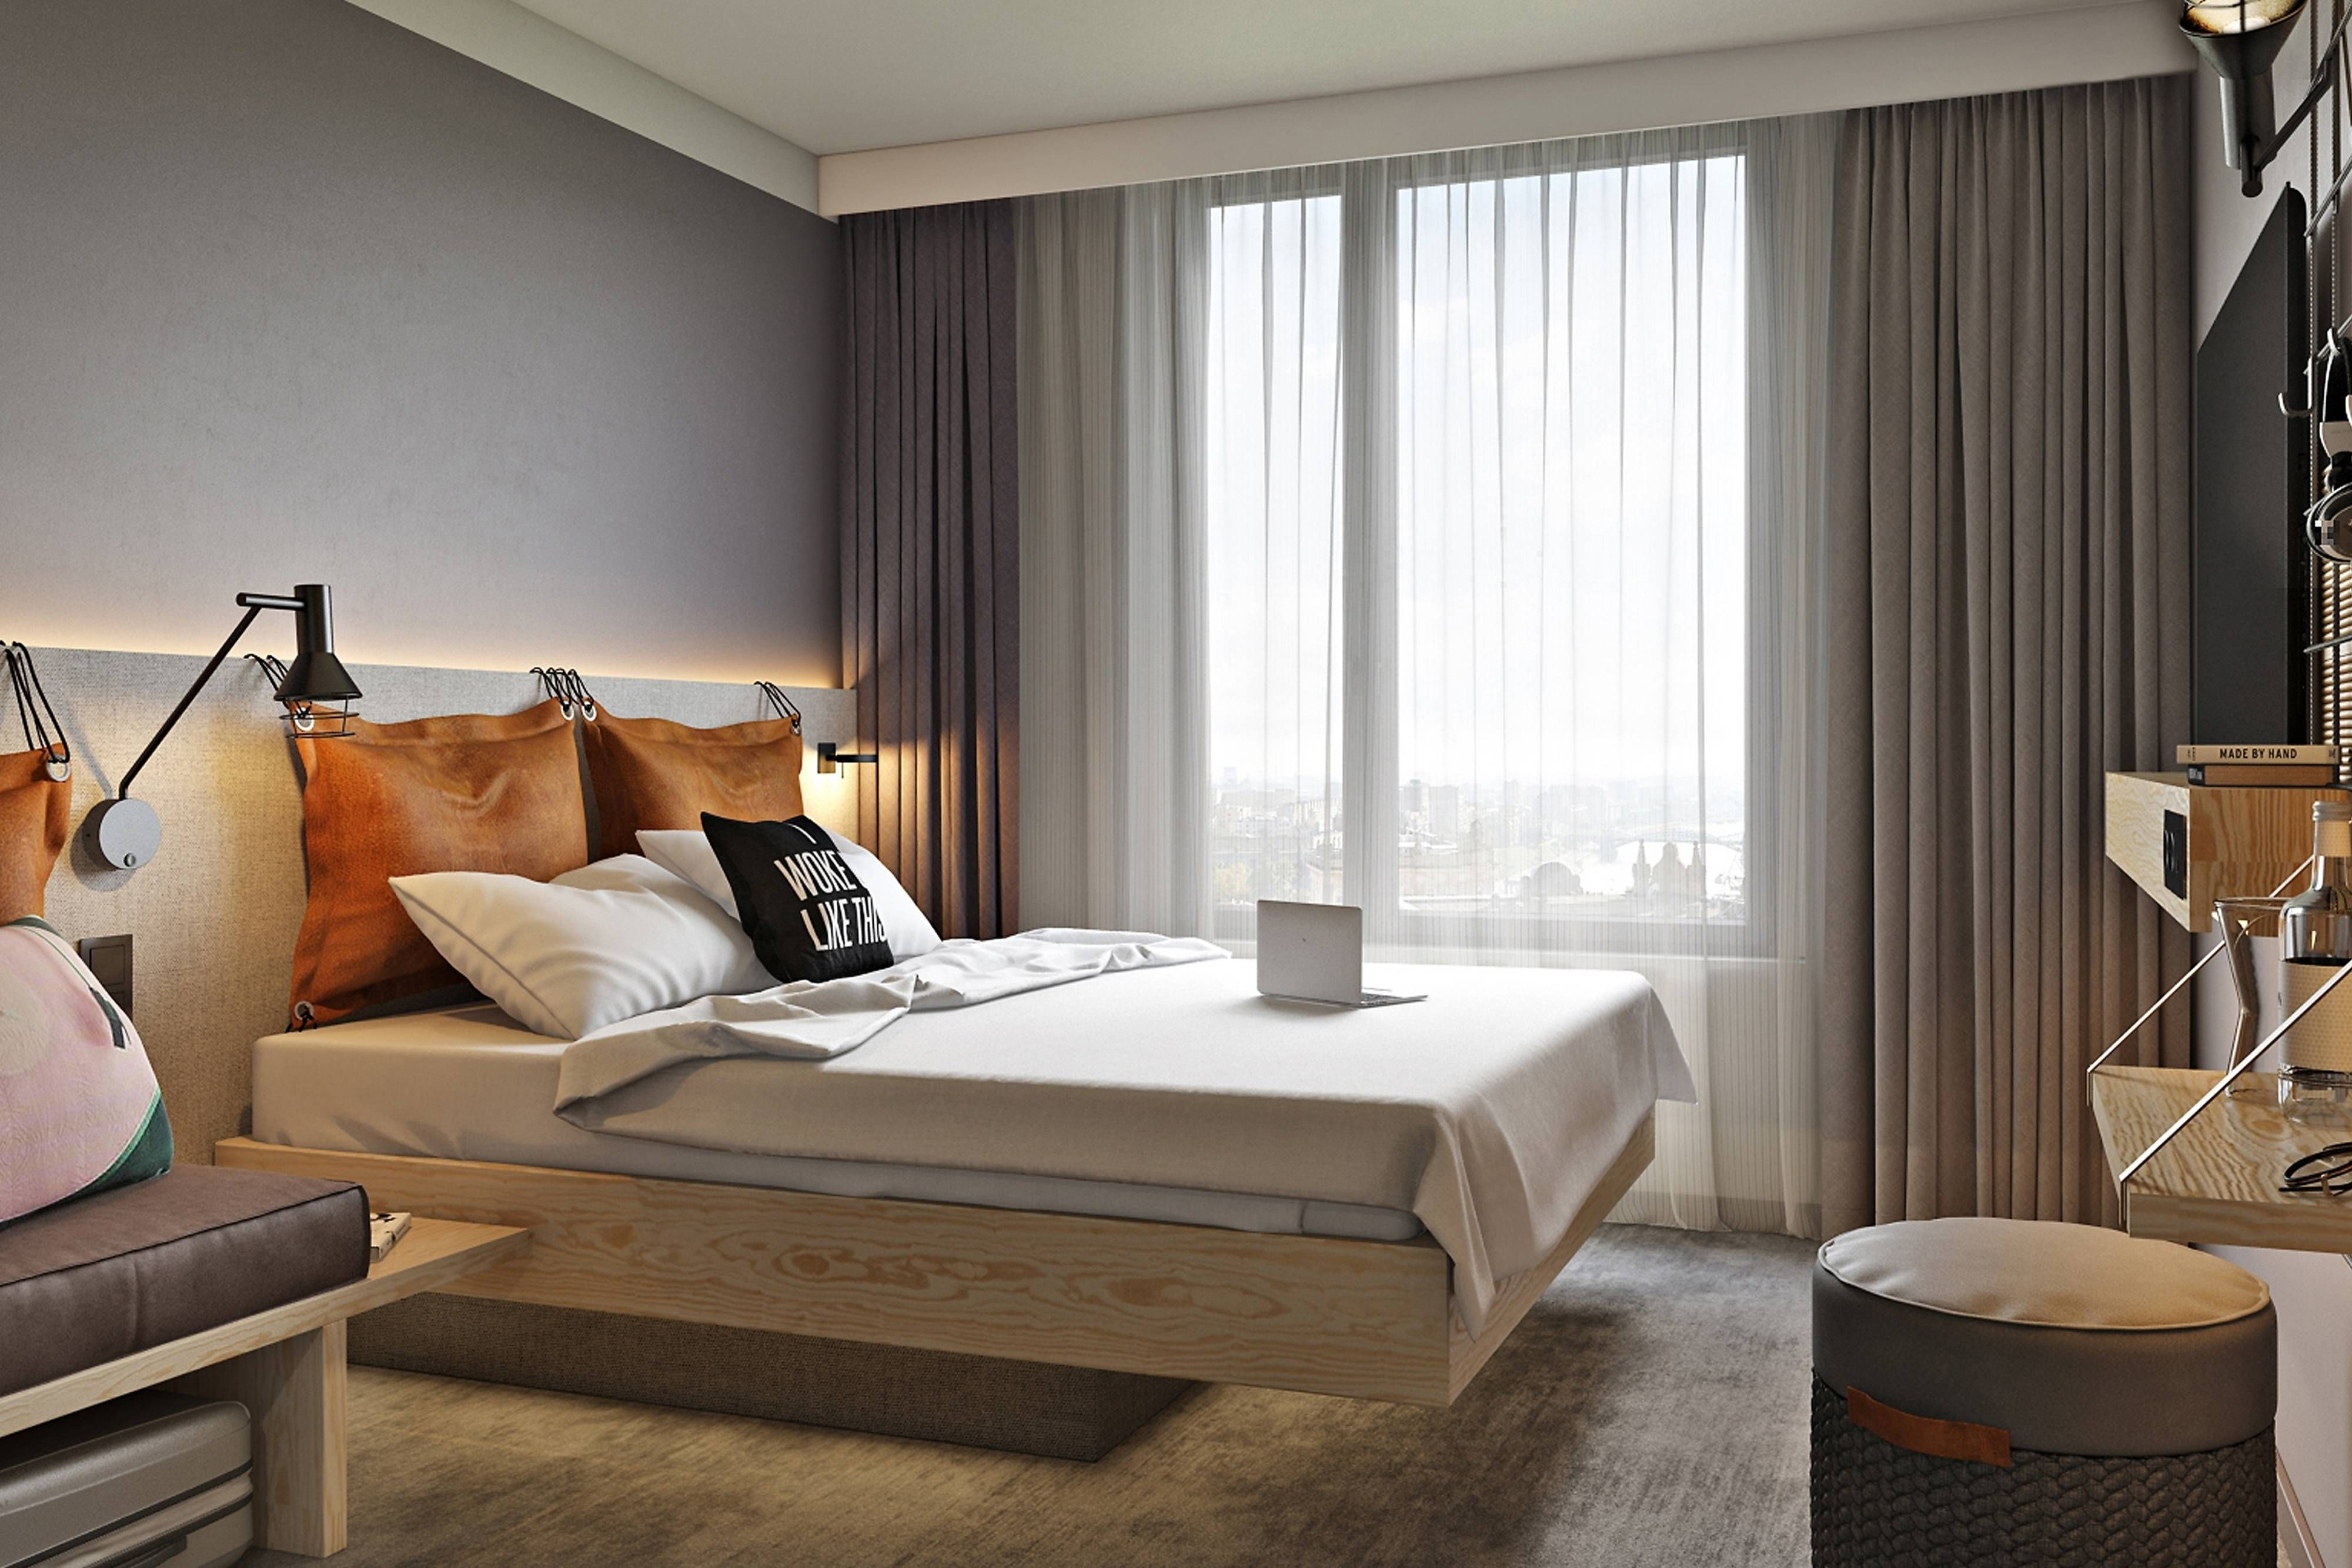 Moxy Frankfurt City Center Moxy Queen Sleeper Suite Comfort Enjoying European Hotel Home Decor Interior